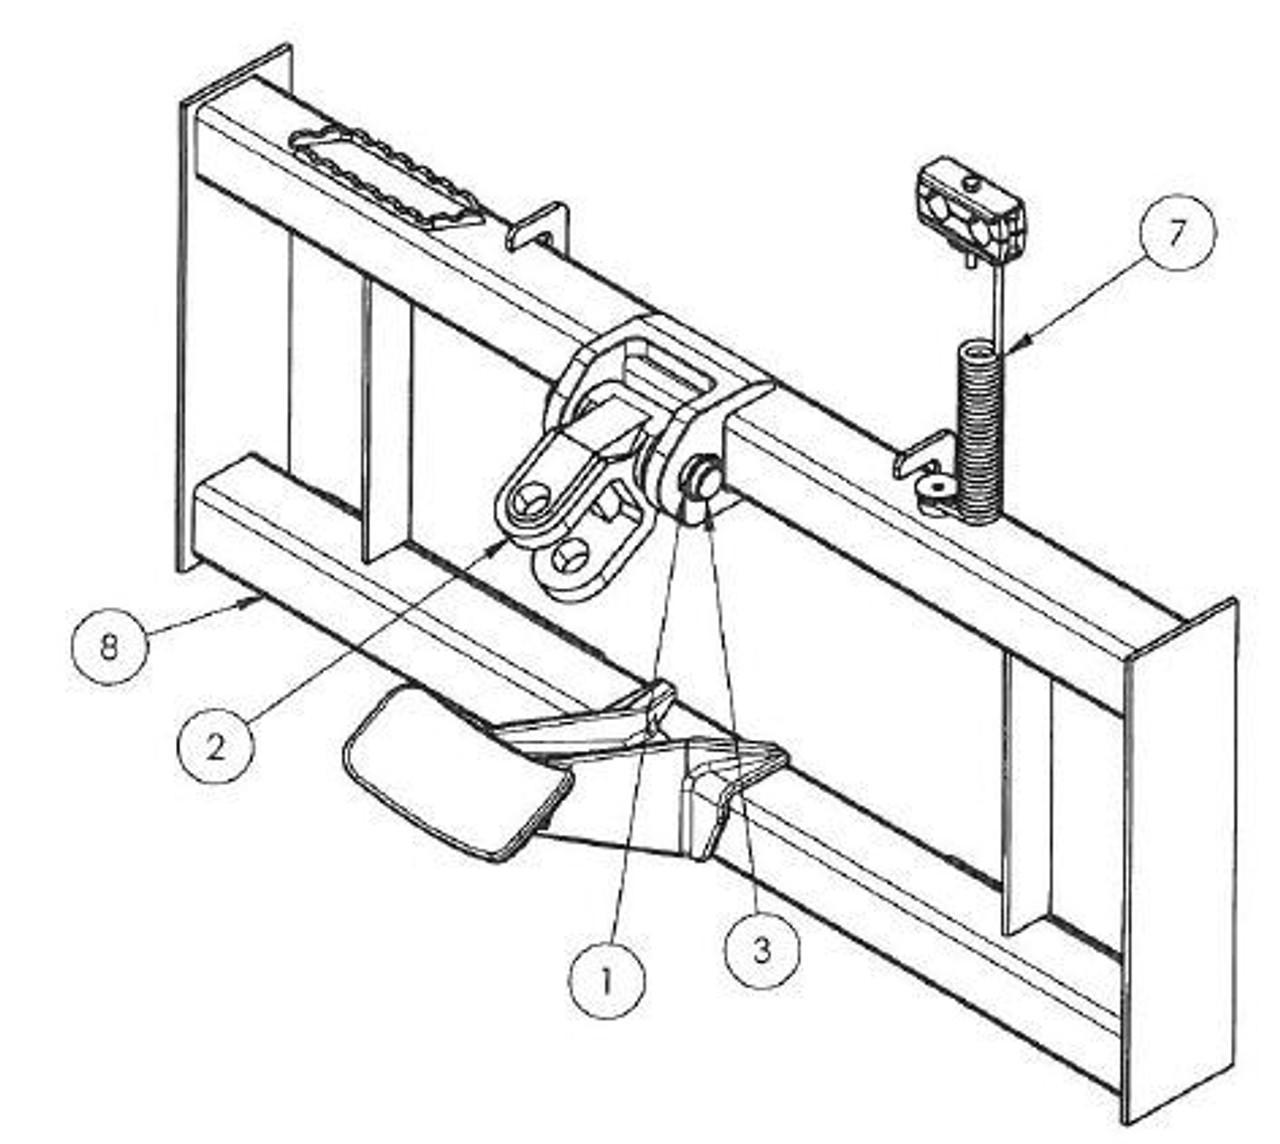 Skid Steer Auger Universal Loader Mounting Plate